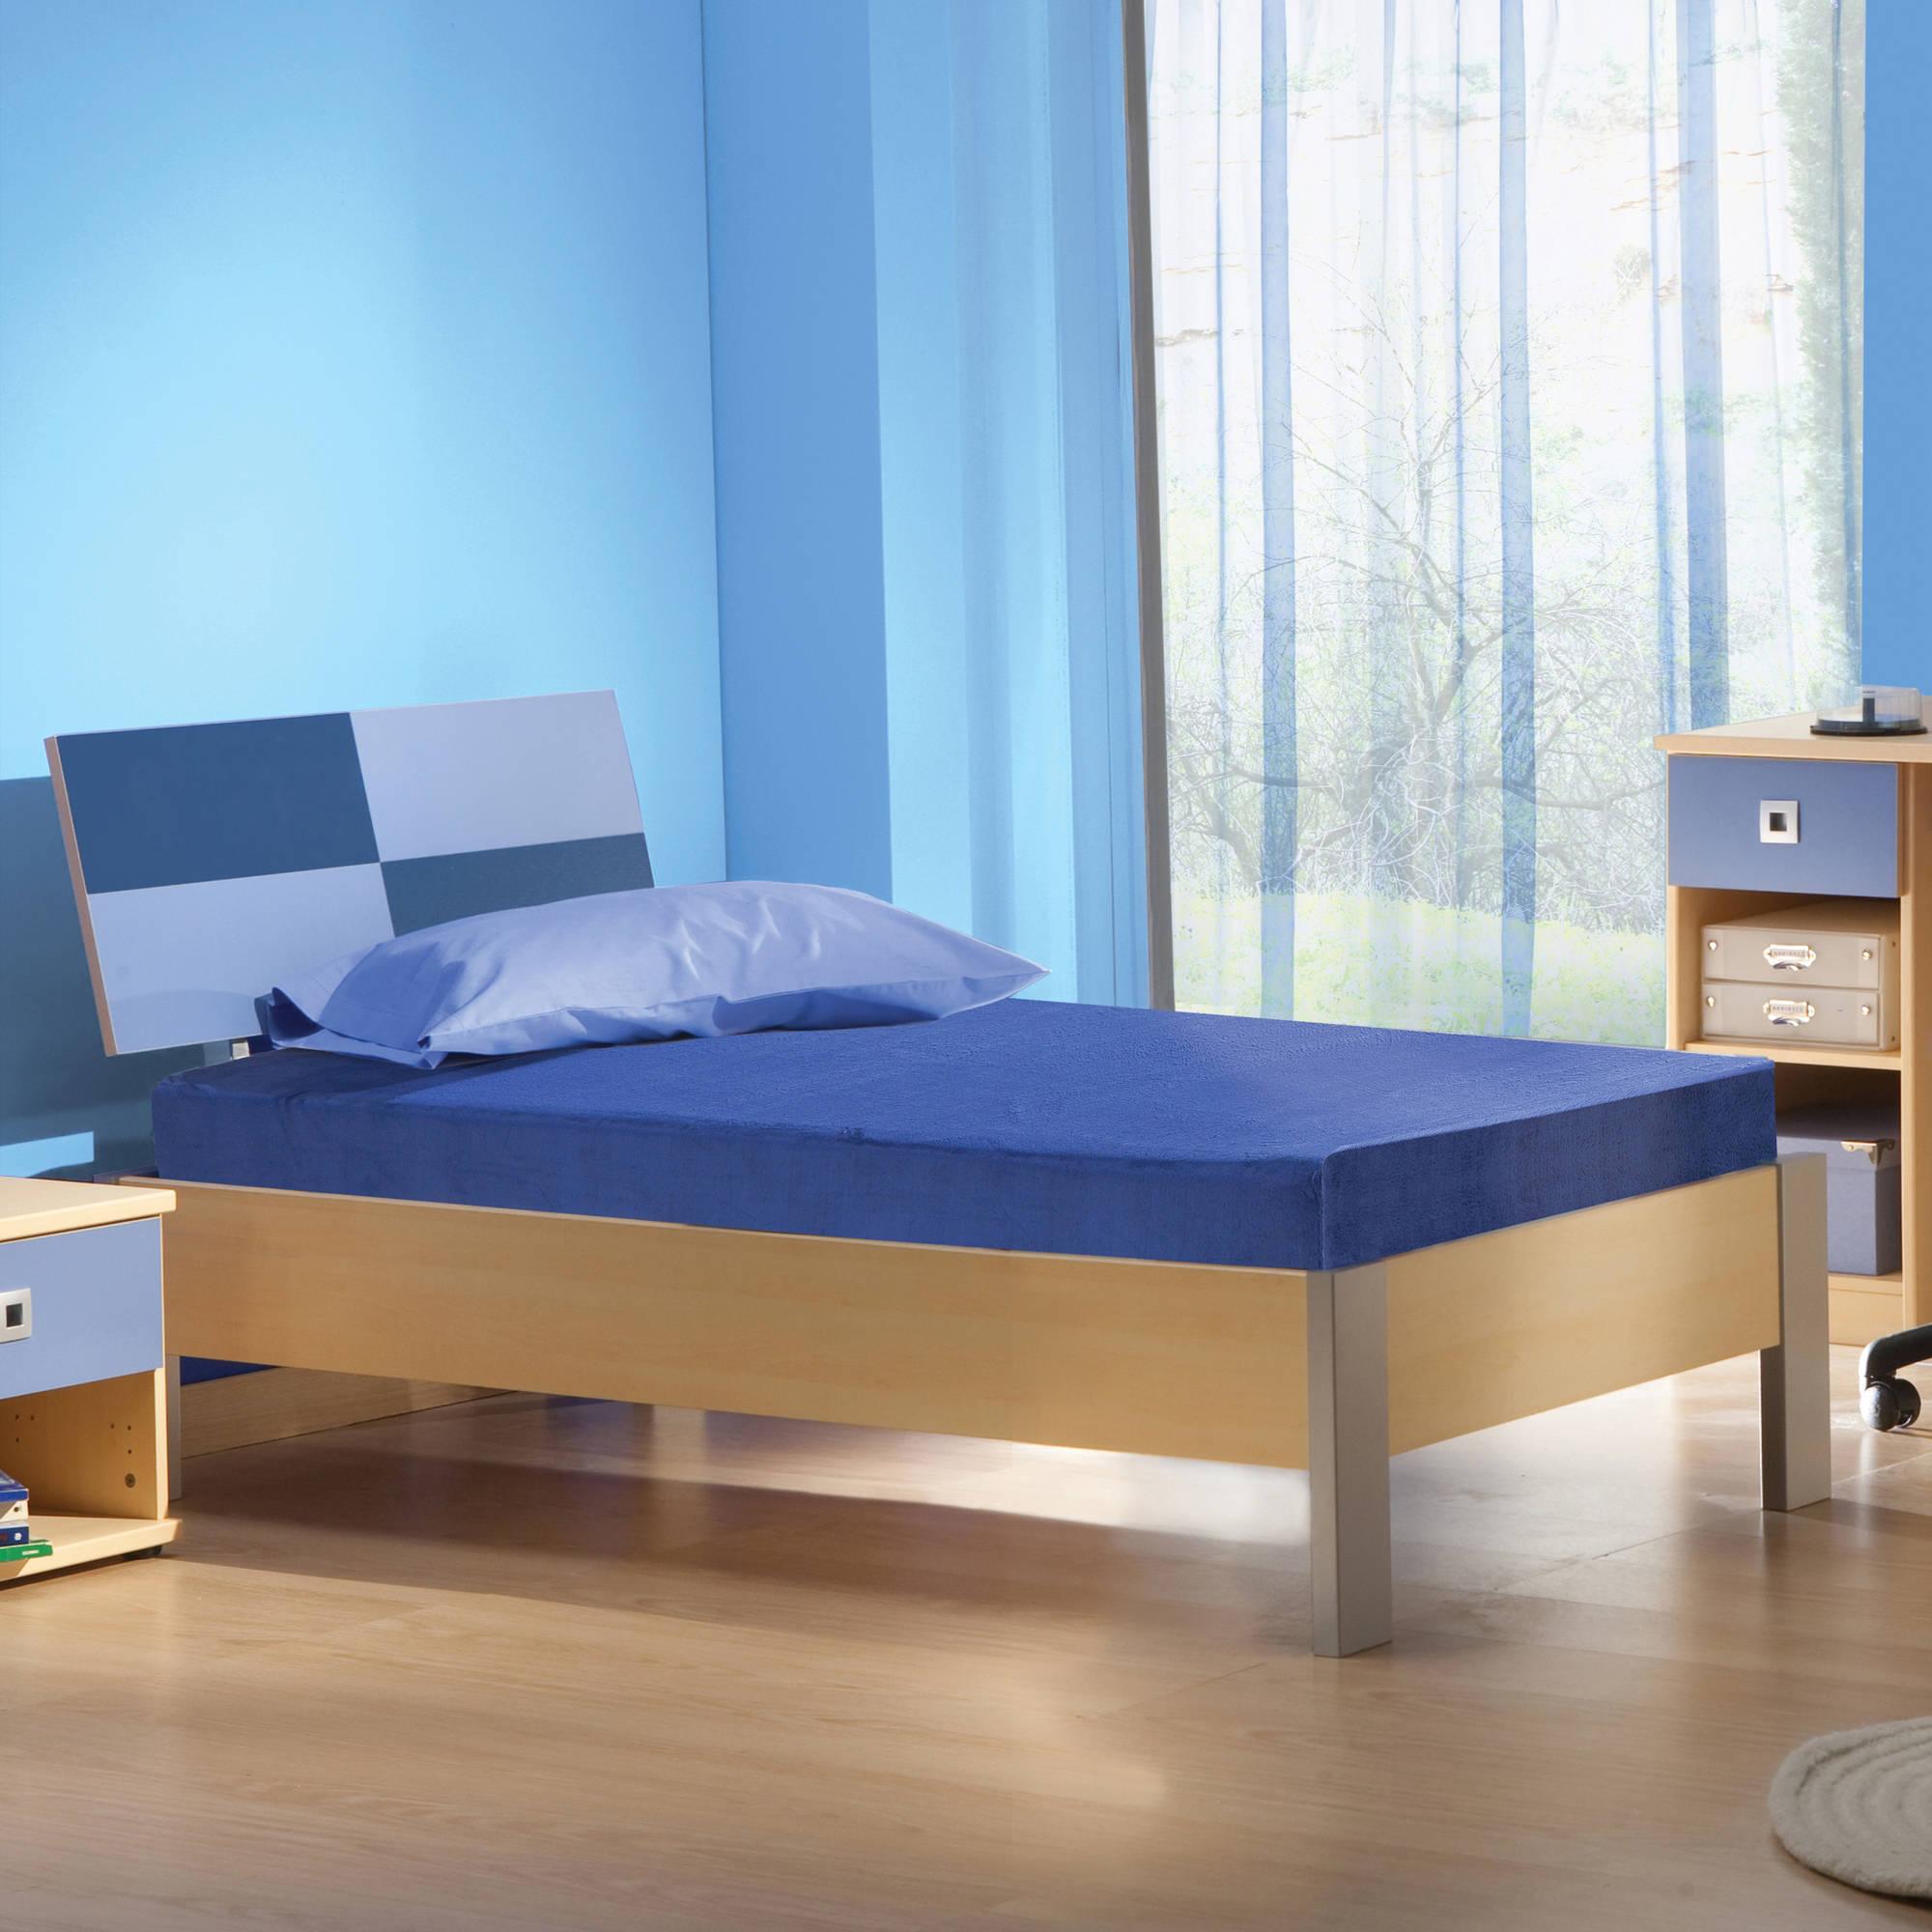 Contura 5 Inch Kids Memory Foam Mattress Blueberry, Multiple Sizes